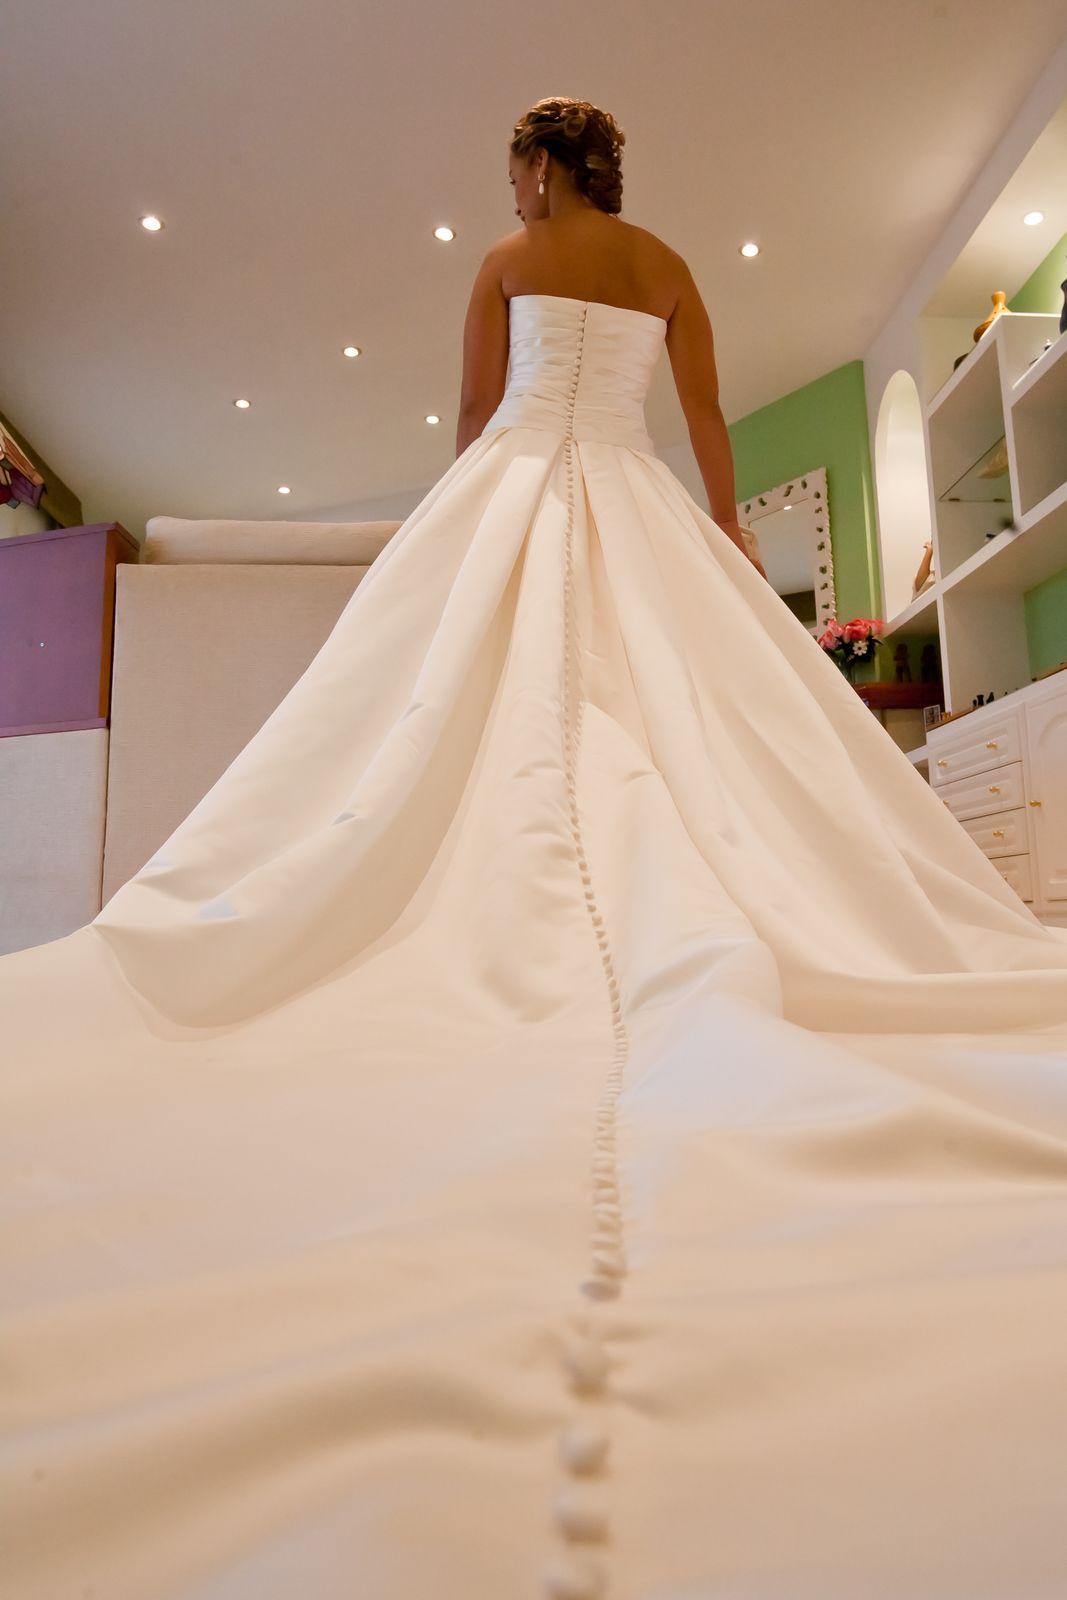 Sell My Wedding Dress. 1